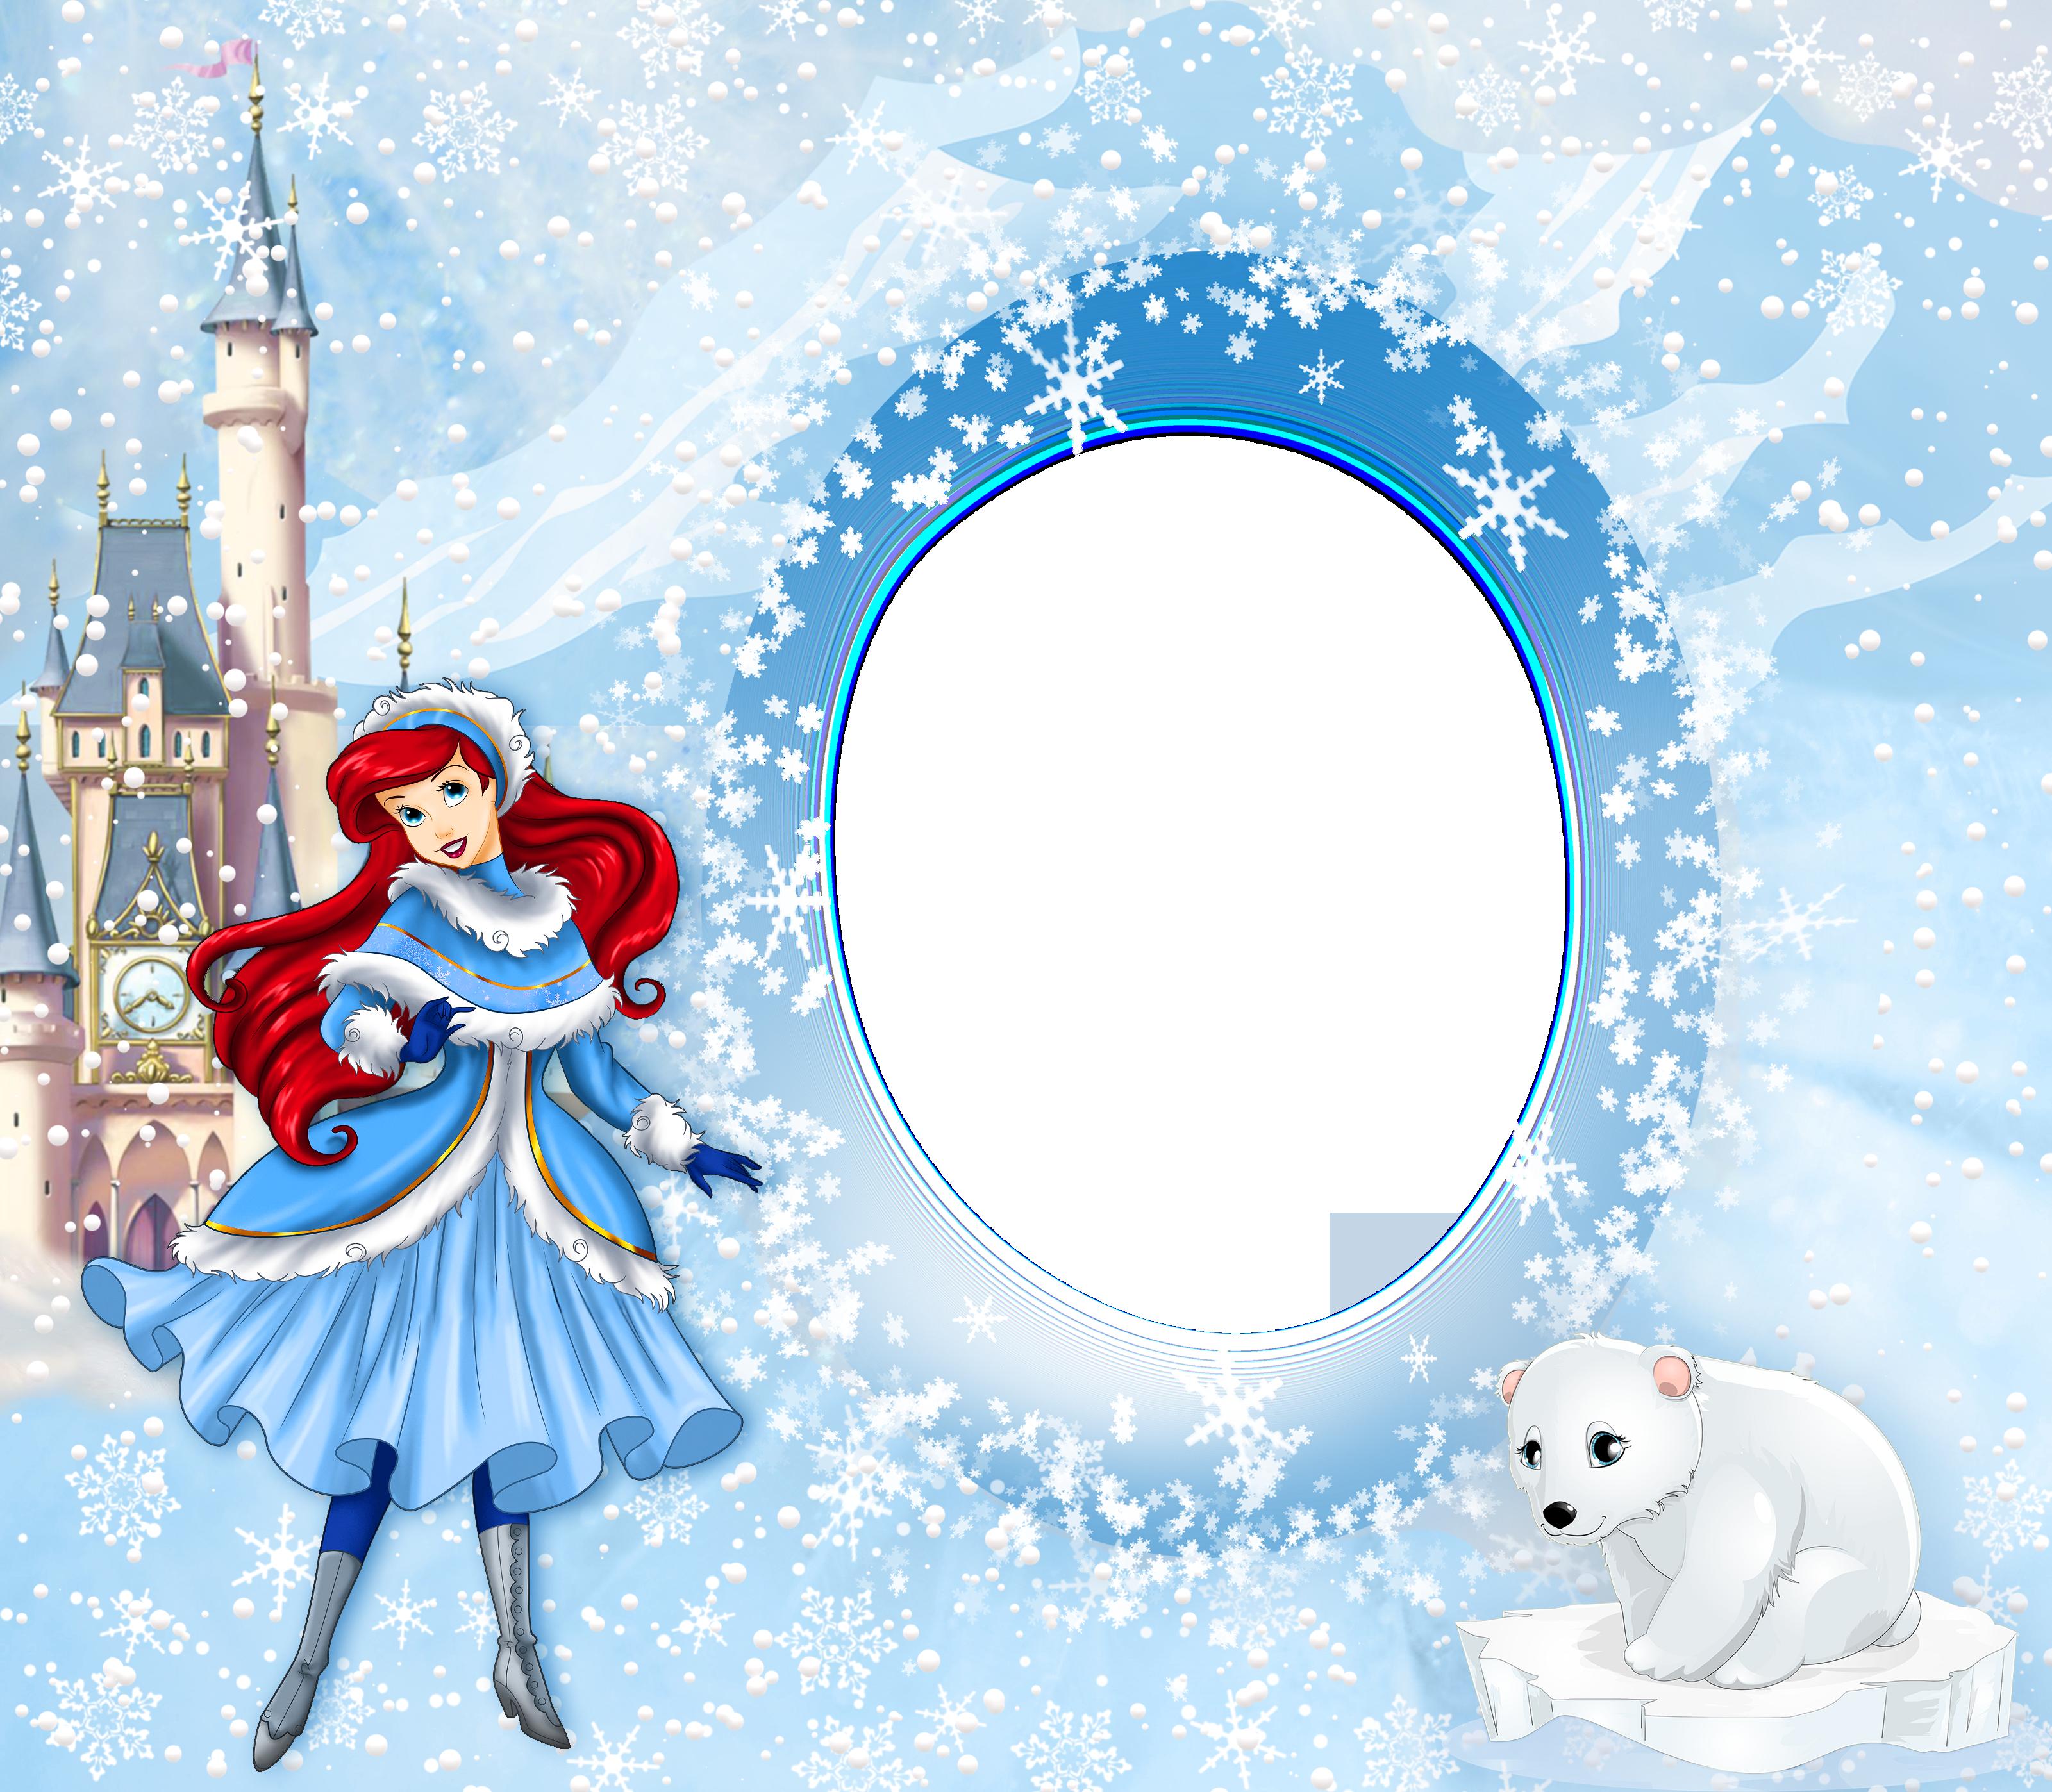 Ariel clipart frame. Princess winter png kids